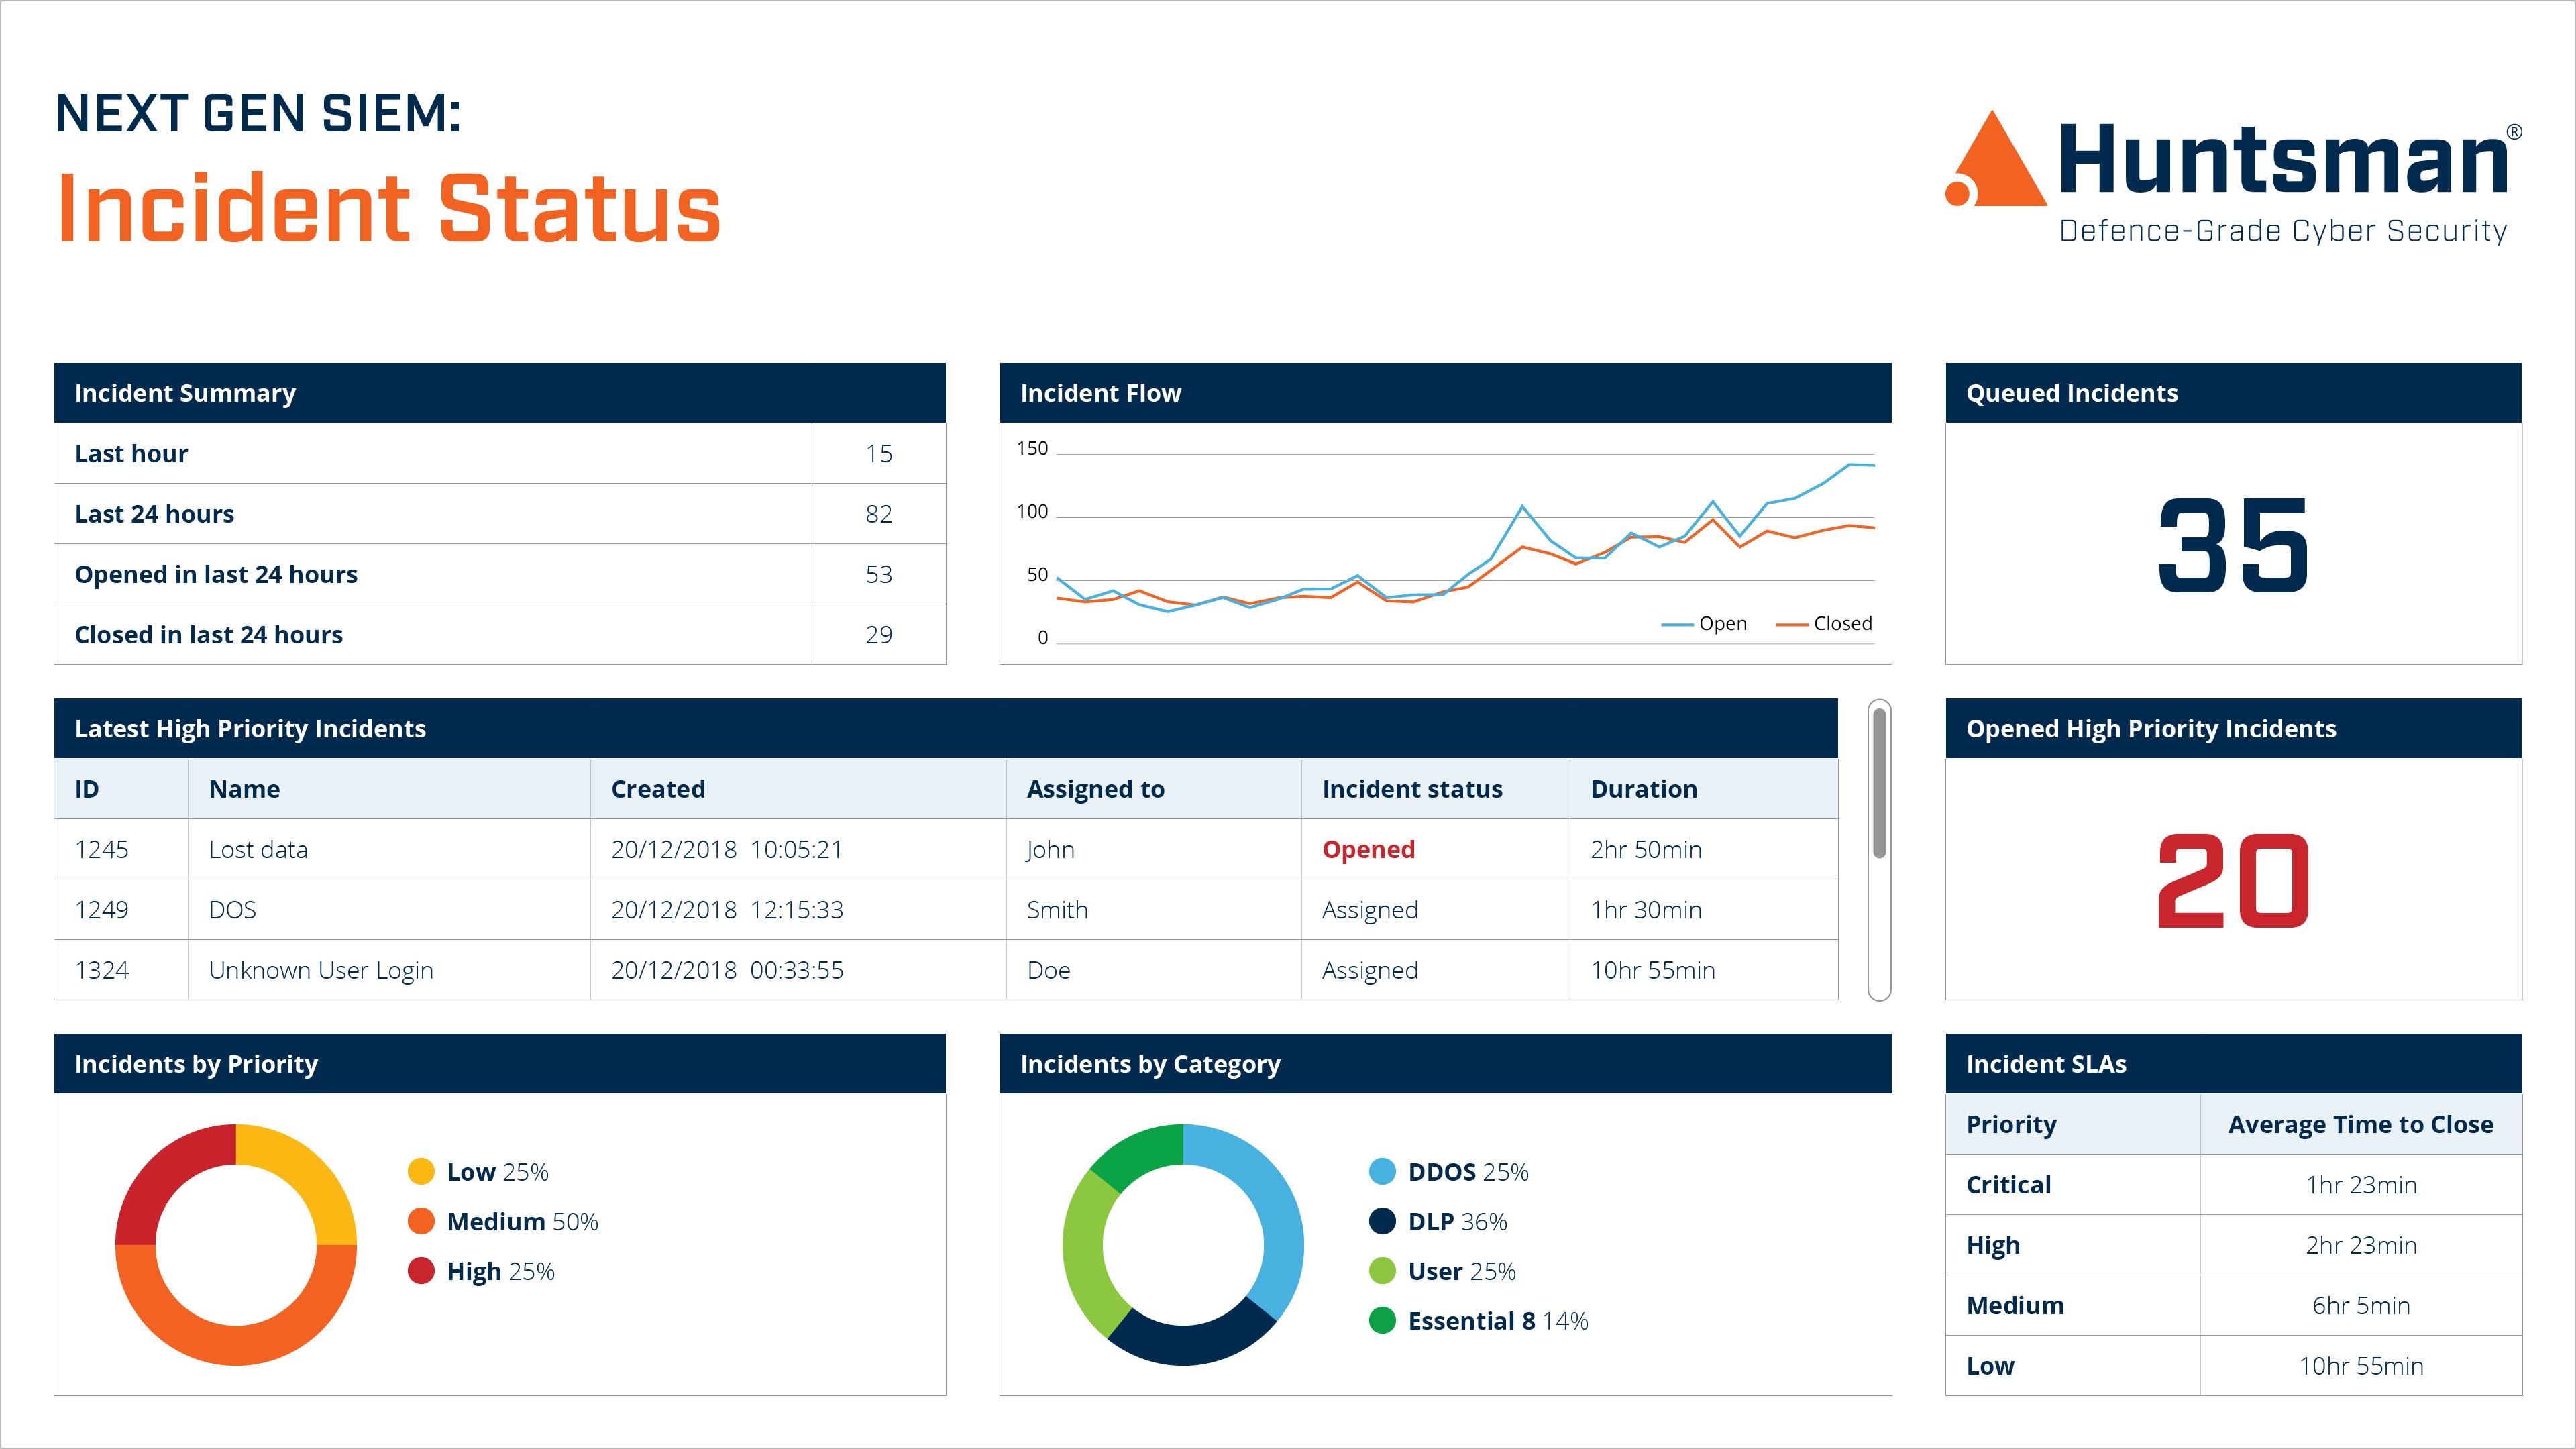 Next Gen SIEM incident response dashboard showing current status